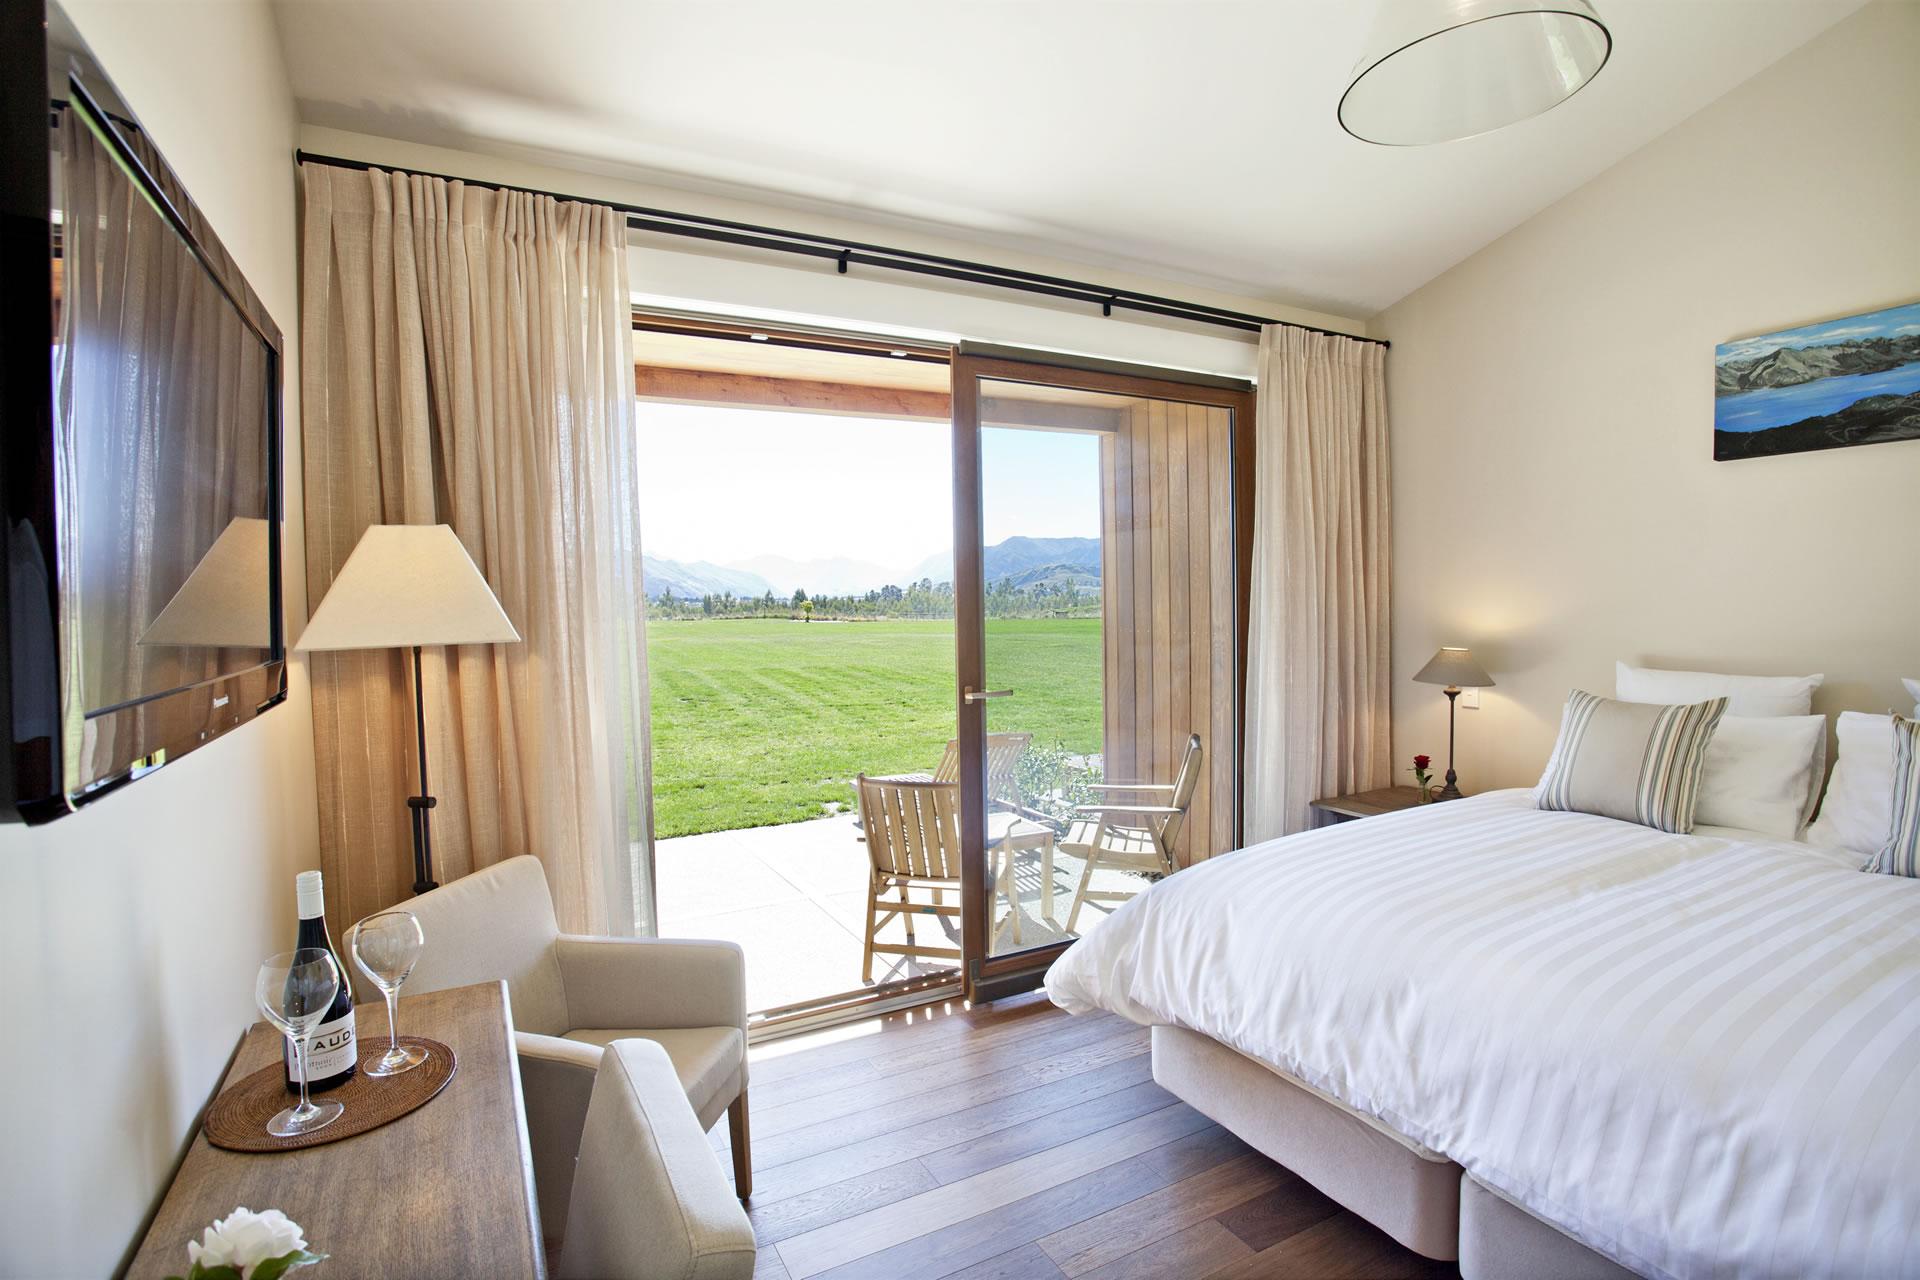 Well+Travelled+Bride+Lake+Wanaka+Haven+Honeymoon+Accommodation+03.jpg